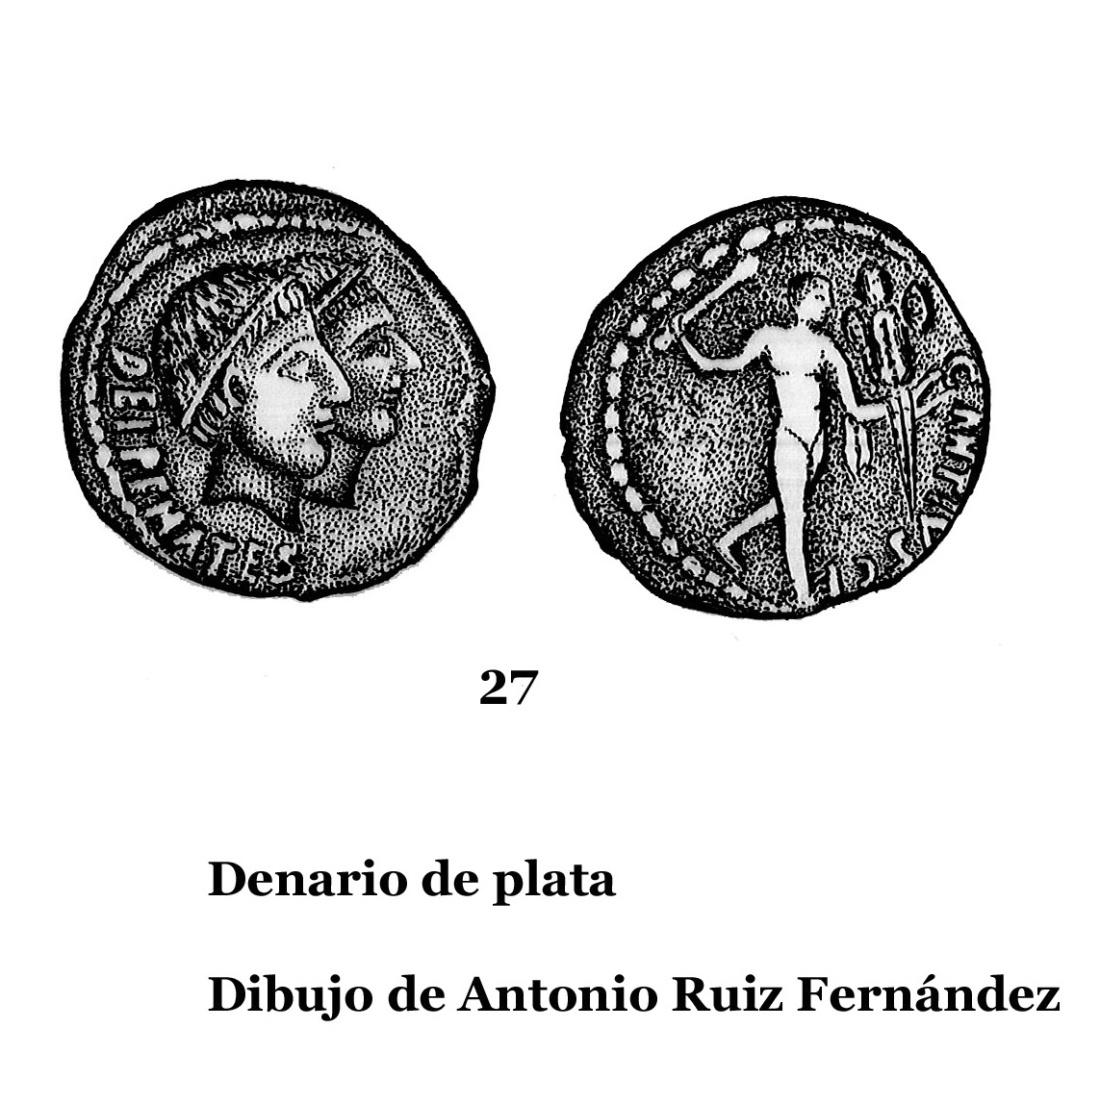 27DENARIOS DE PLATA, DIBUJOS 27